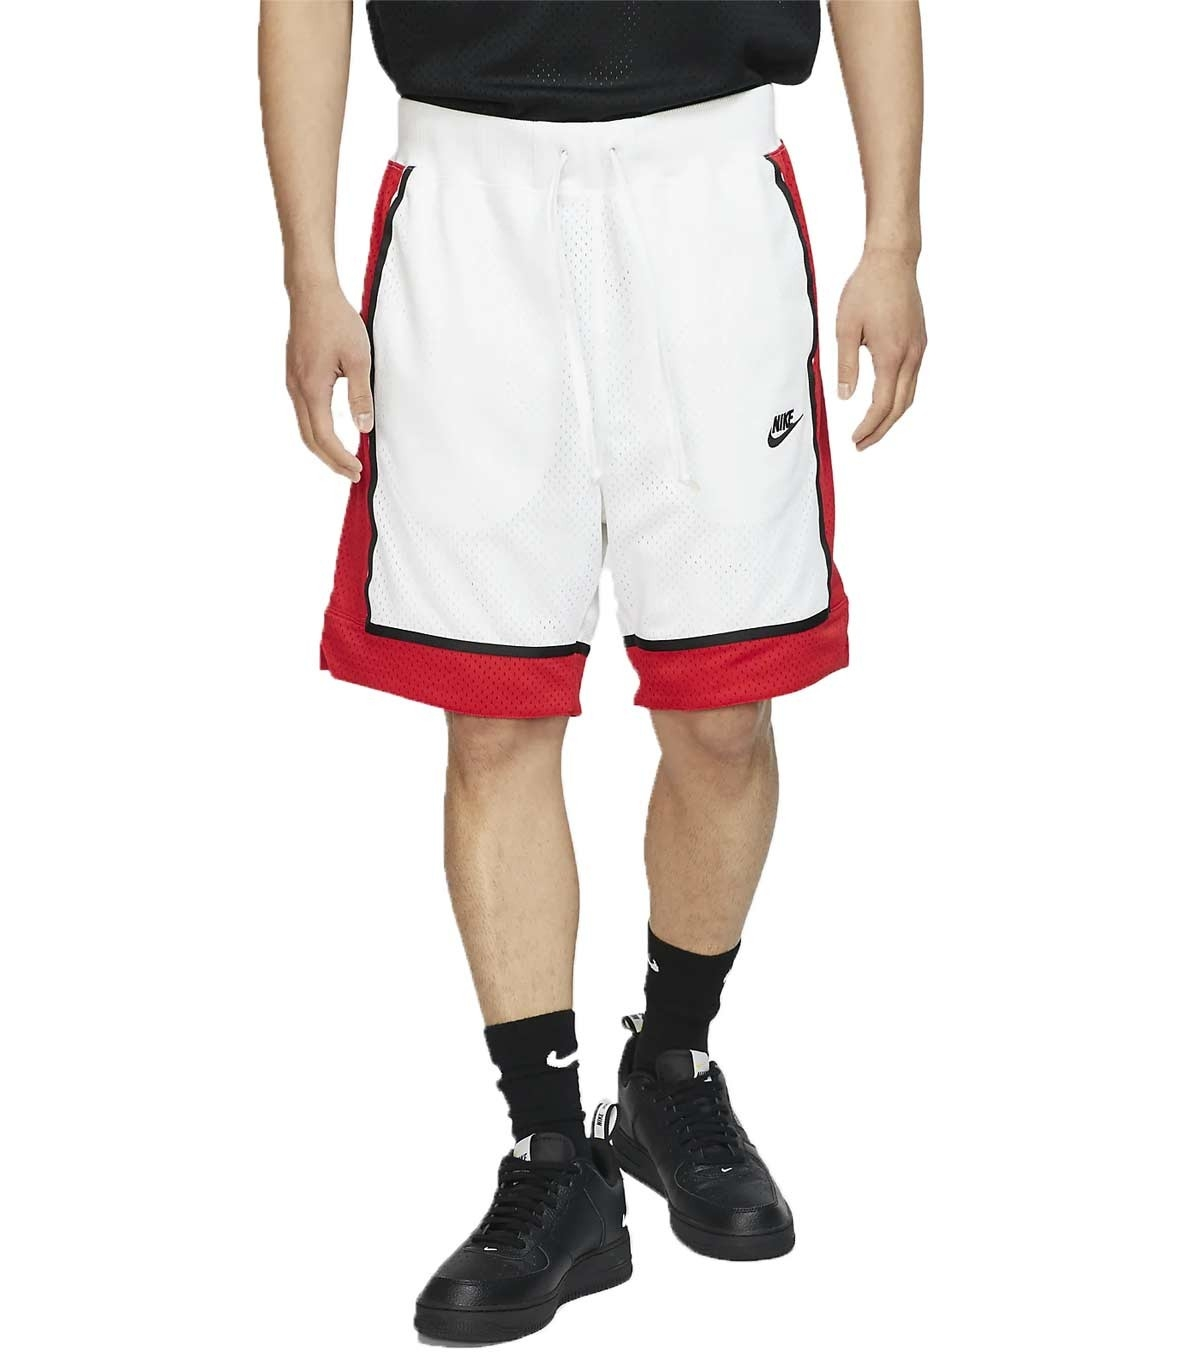 Comprar Pantalon Nike Nike Moda